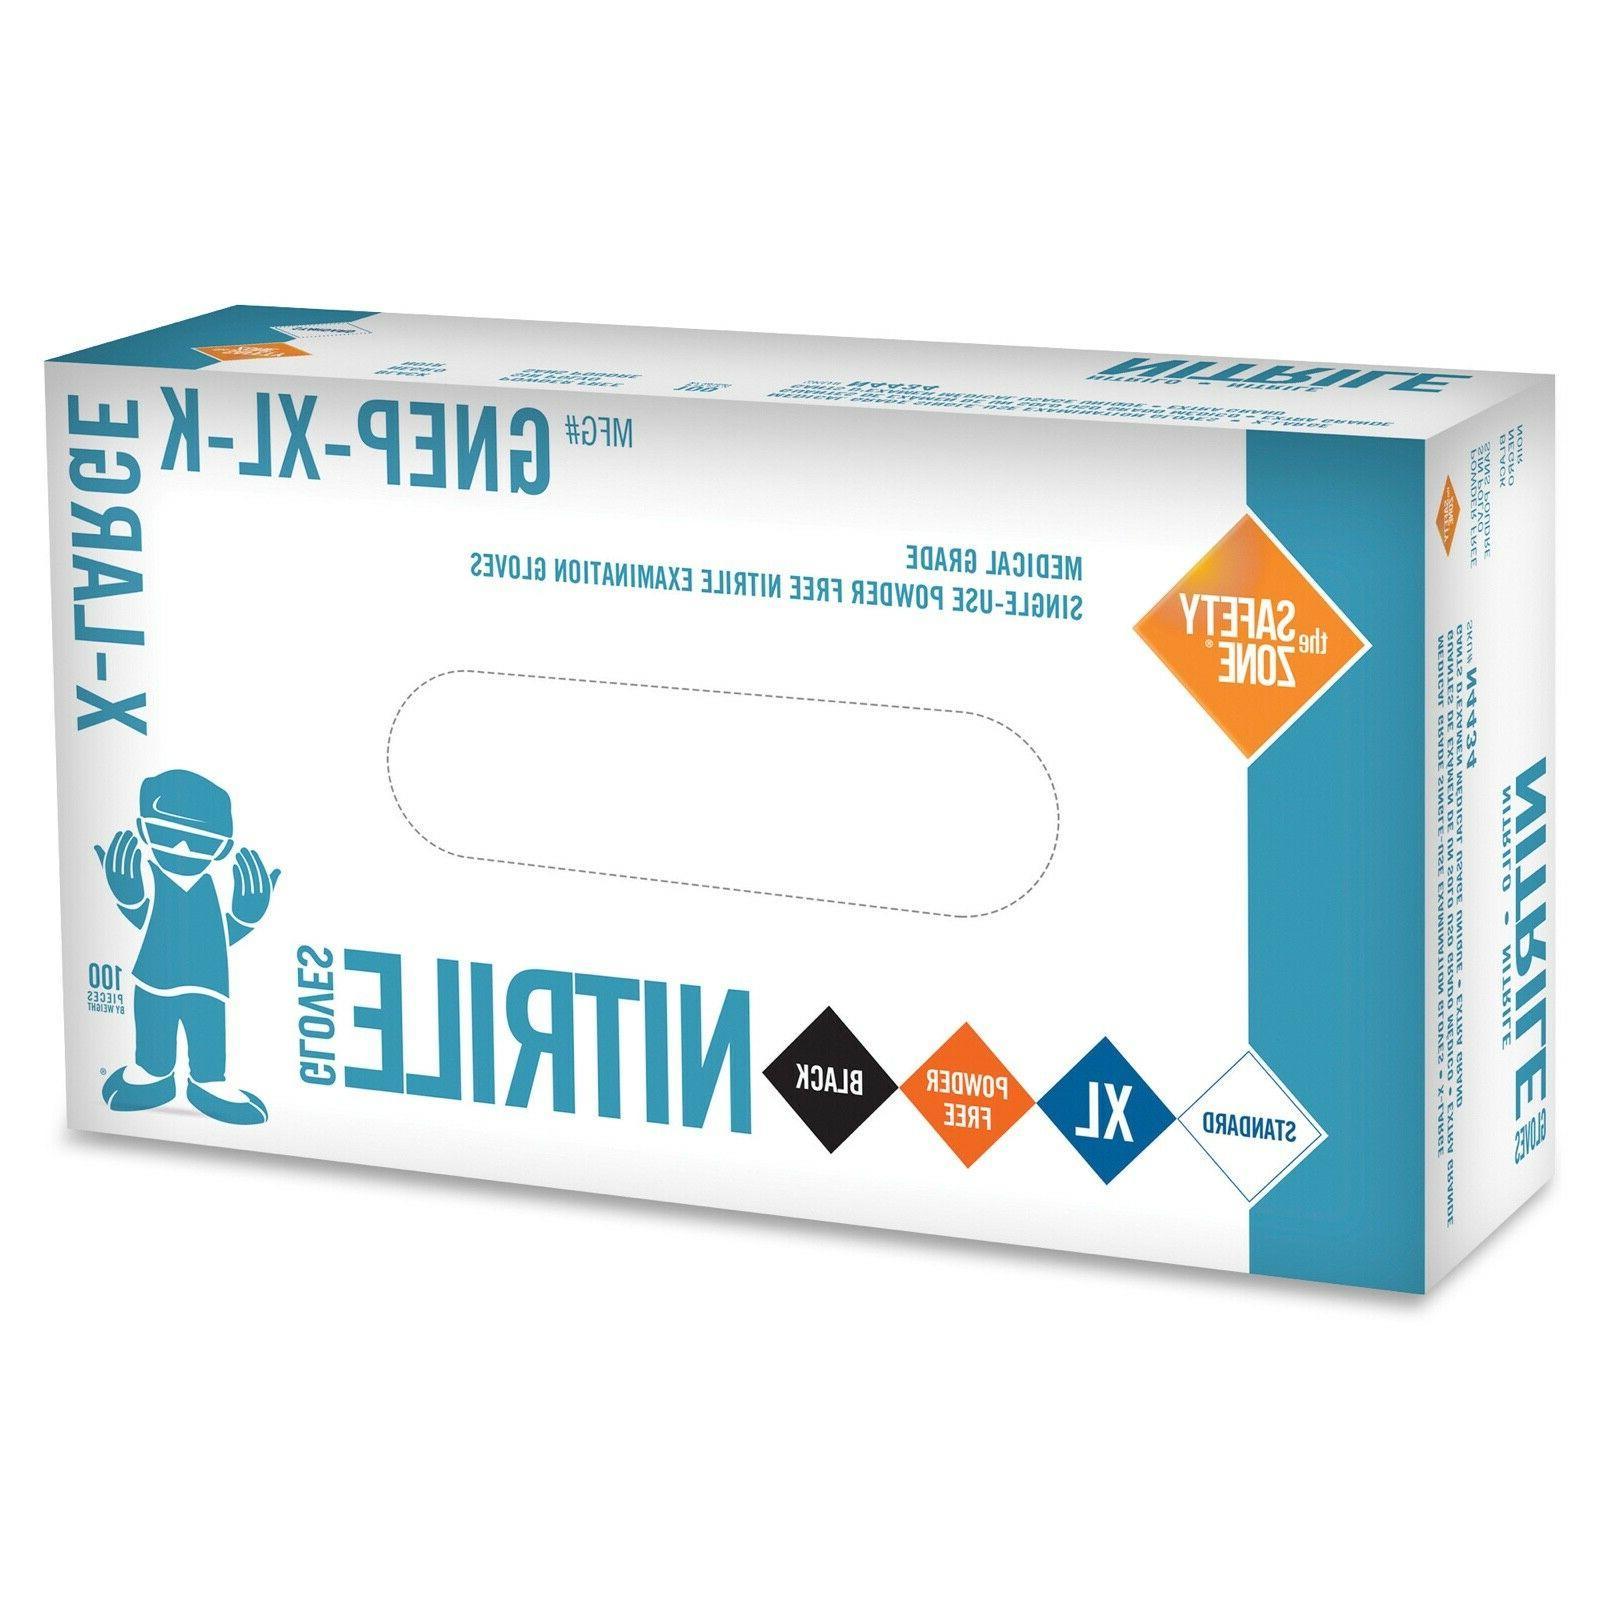 L XL Latex EXAMINATION 50/100/500/1000